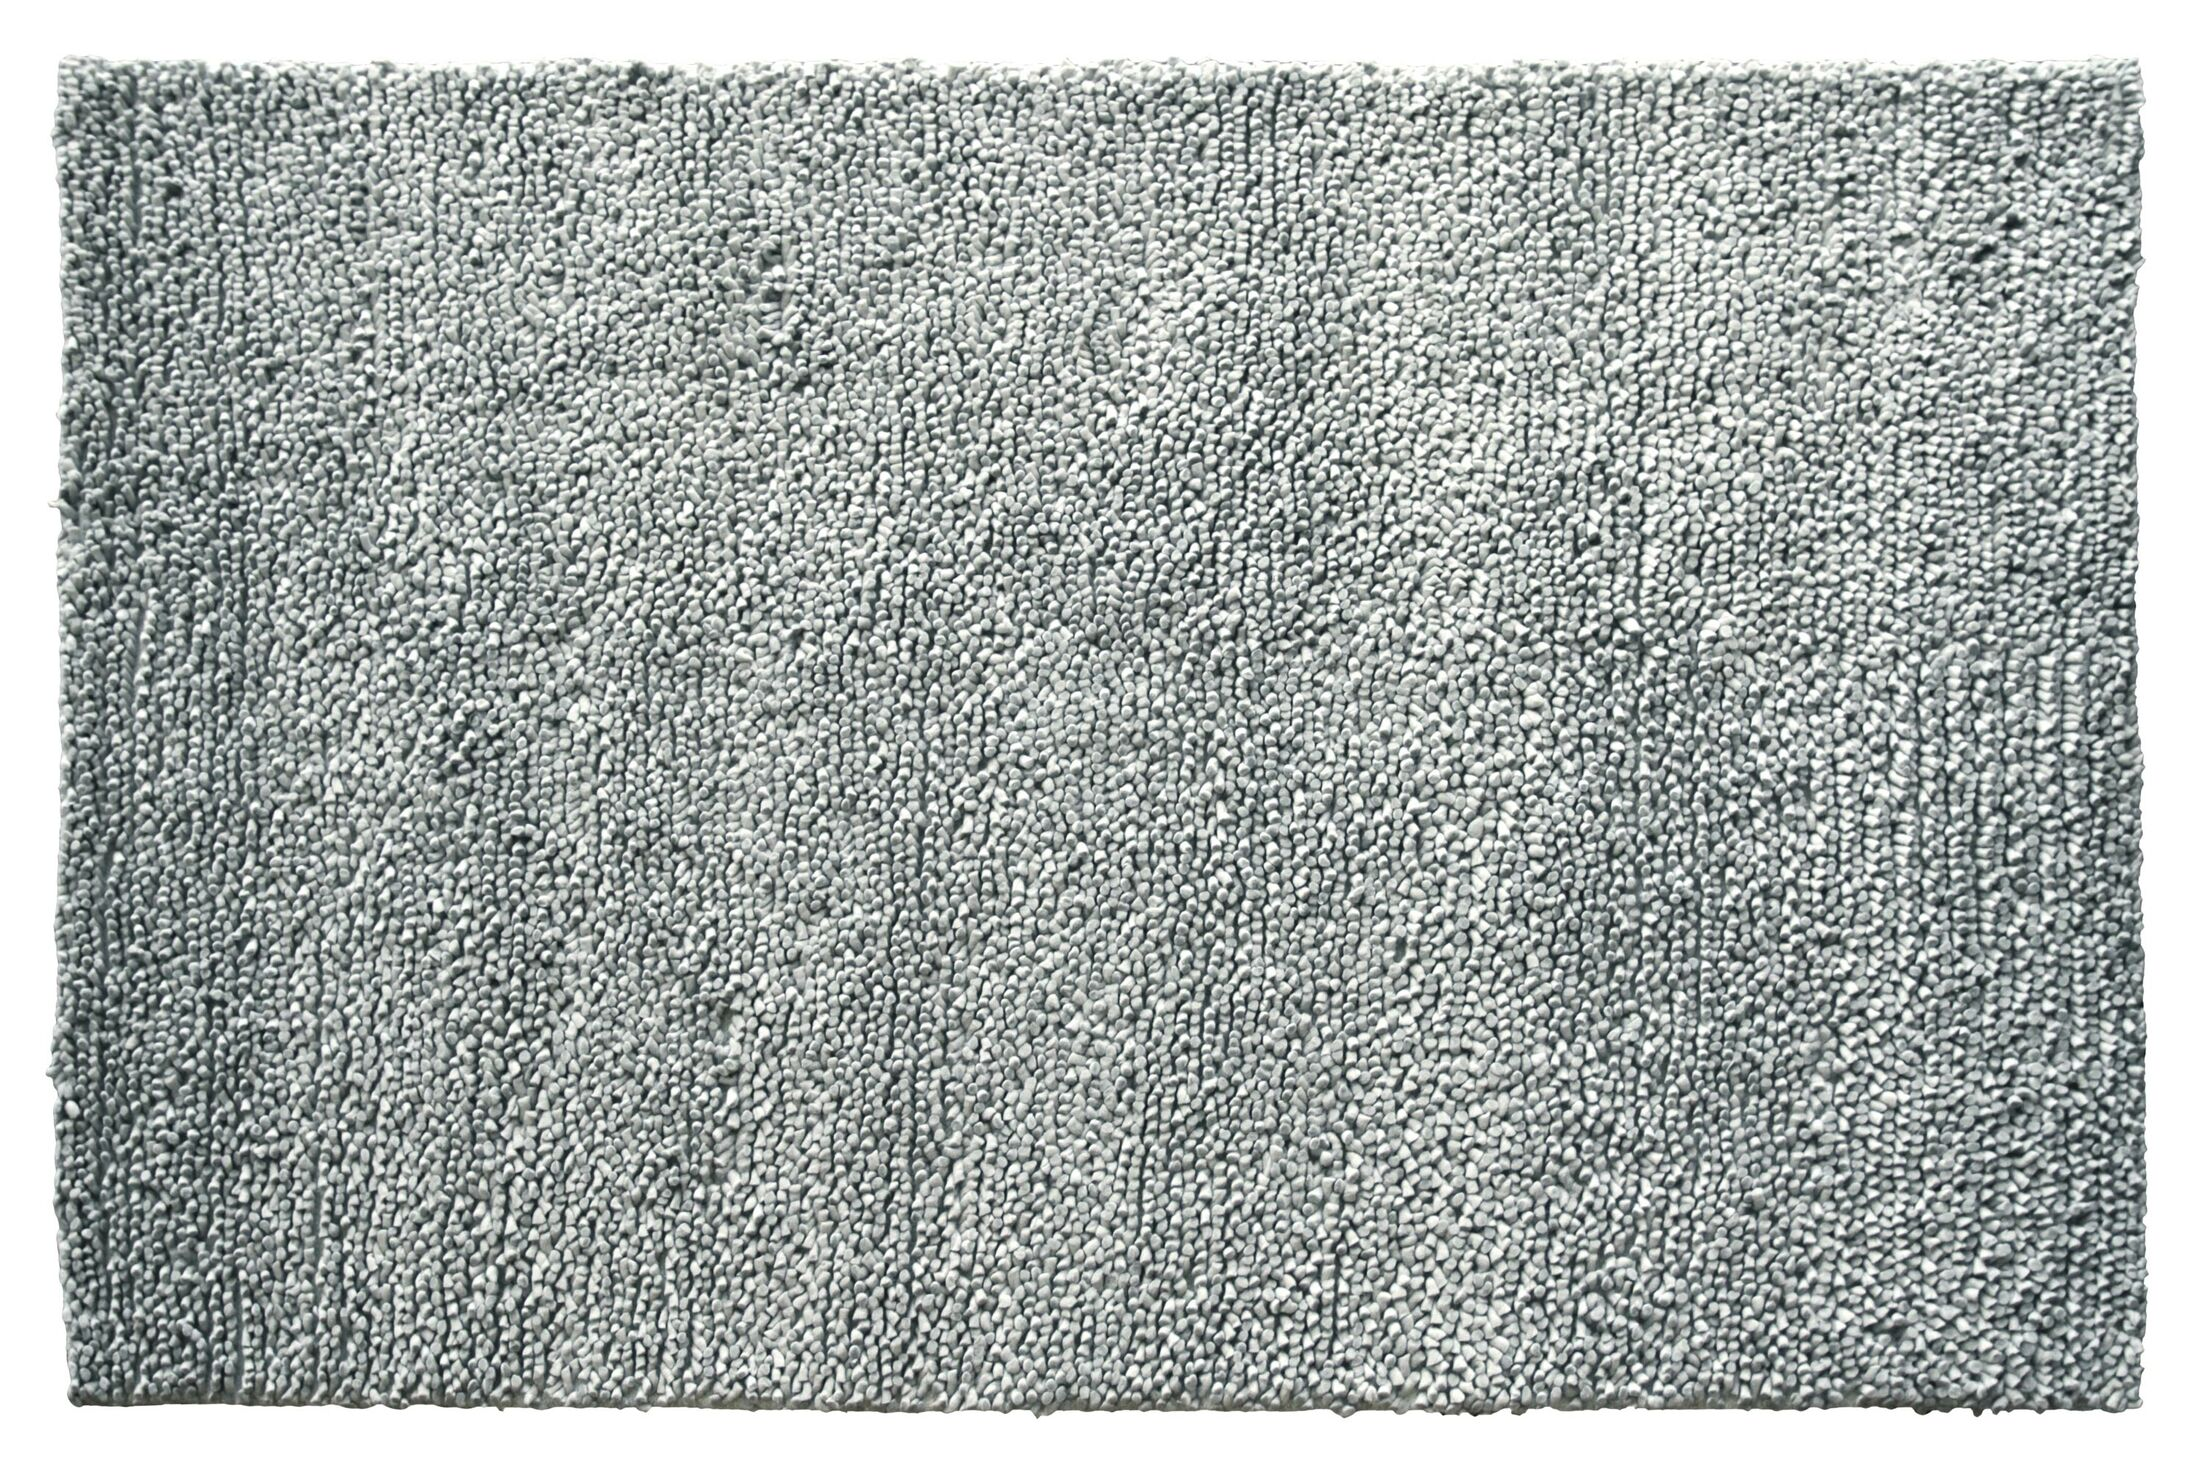 Cush Gray Rug Rug Size: Rectangle 6' x 9'